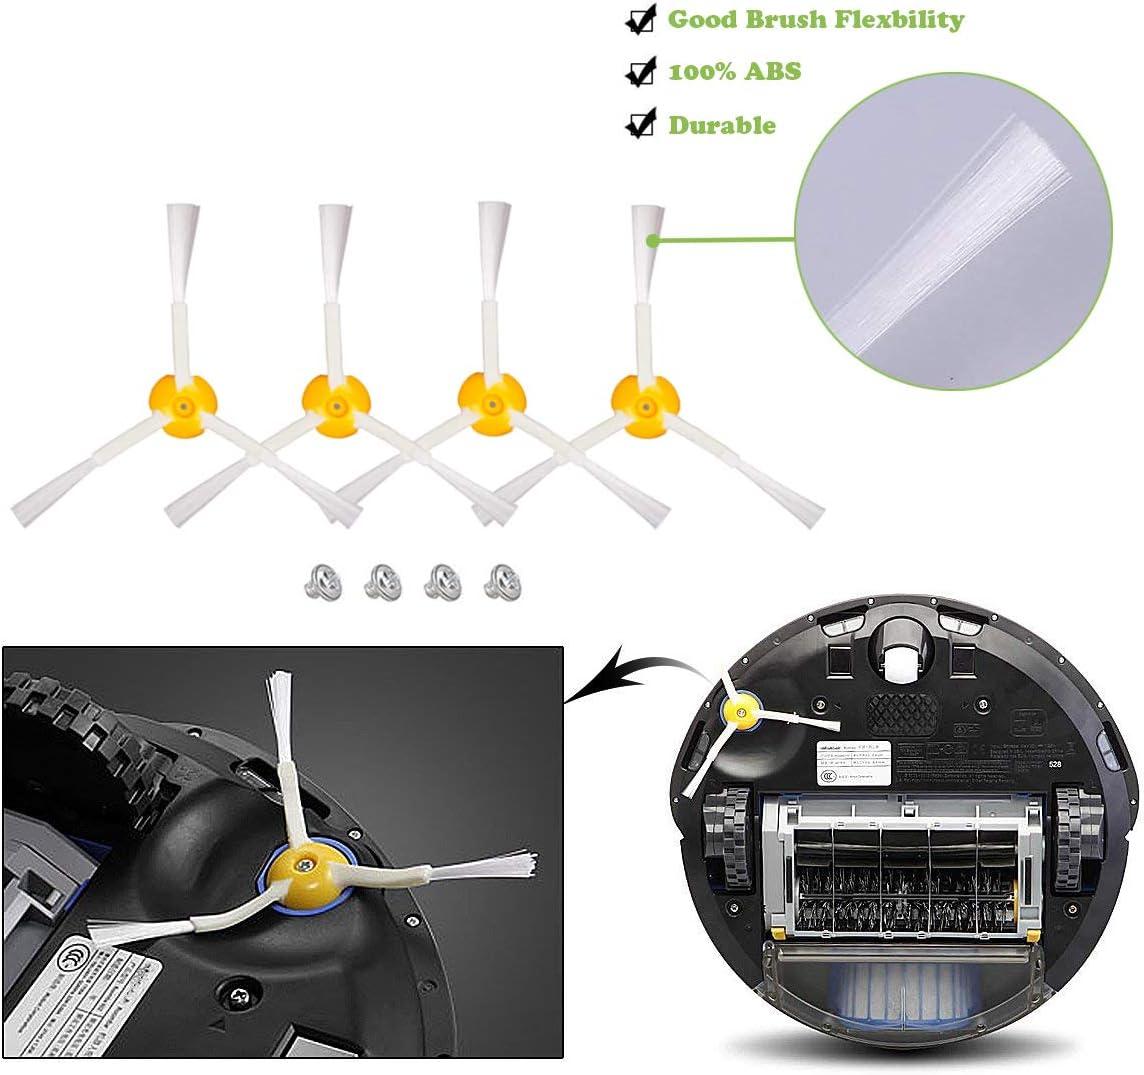 HoHome Accesorios para iRobot Roomba Serie 600, Roomba Cepillos Repuestos para 600 605 610 615 616 620 621 625 630 635 640 650 660 665 670 671 676 680 681 690 691 695 - un Conjunto de 15: Amazon.es: Hogar